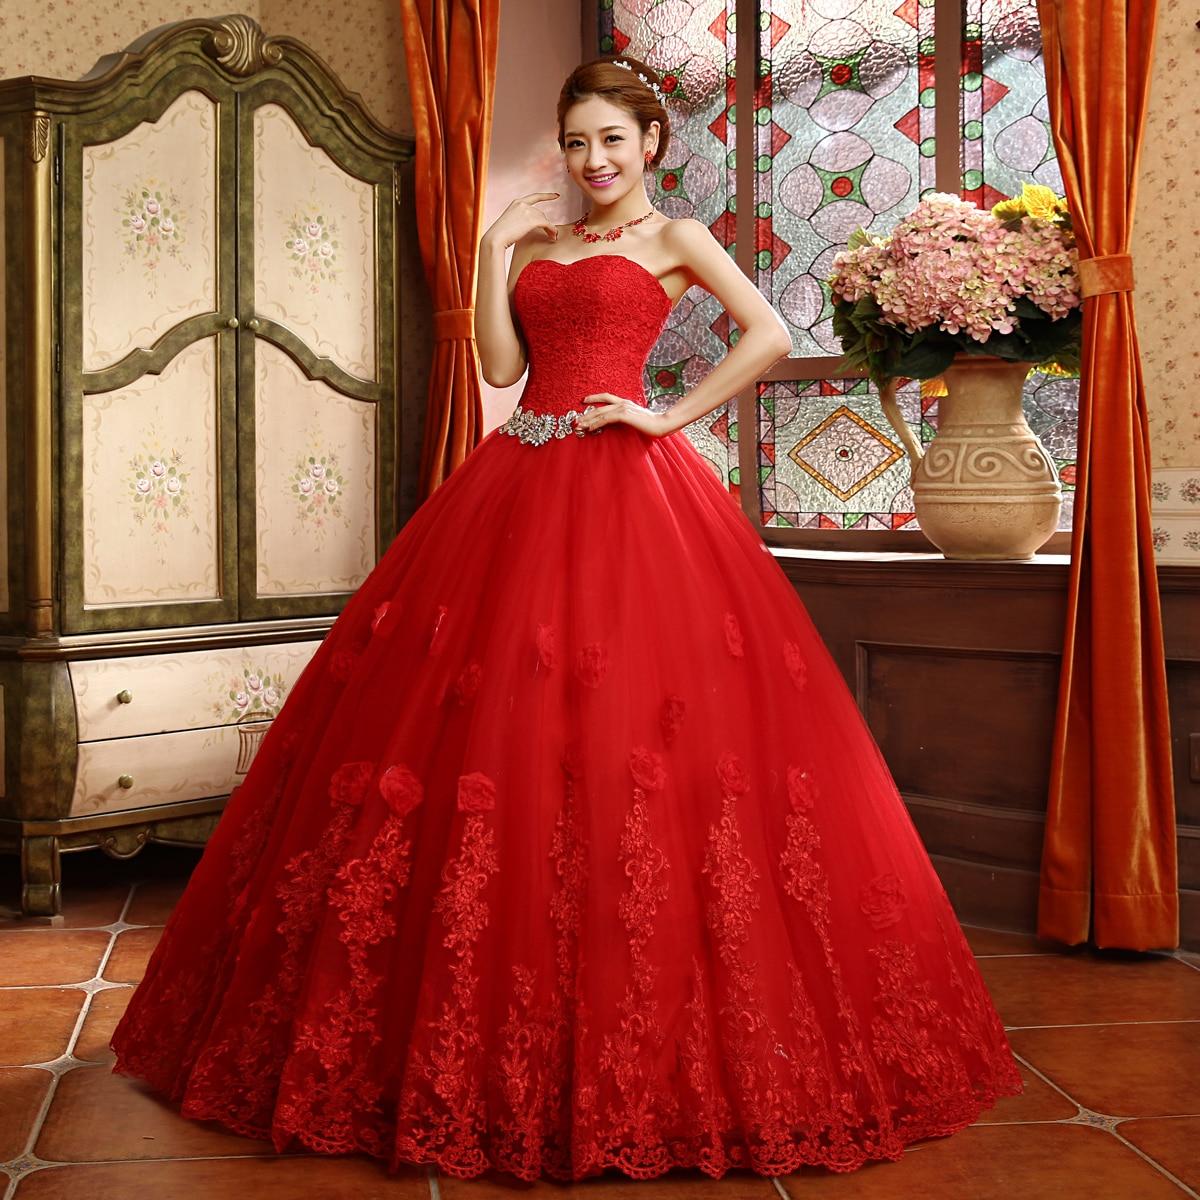 2015 meilleure vente robe de bal en dentelle tulle rouge